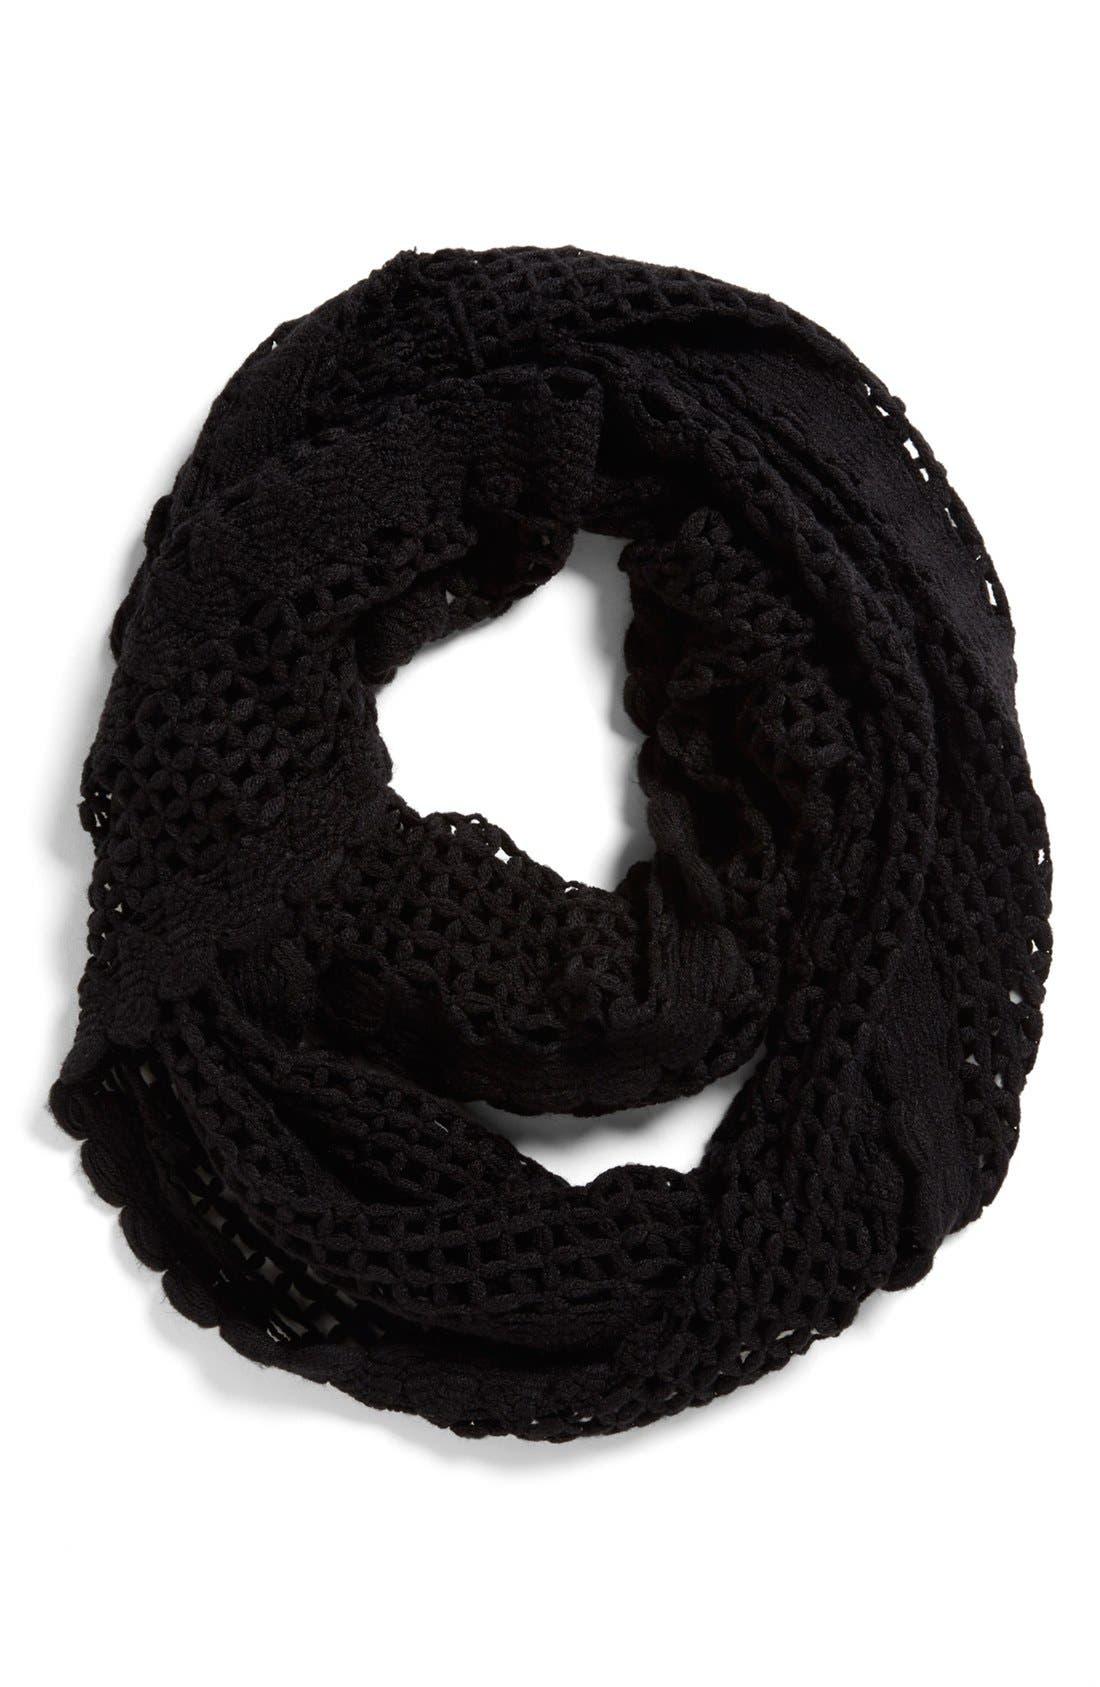 Alternate Image 1 Selected - Tildon Crocheted Infinity Scarf